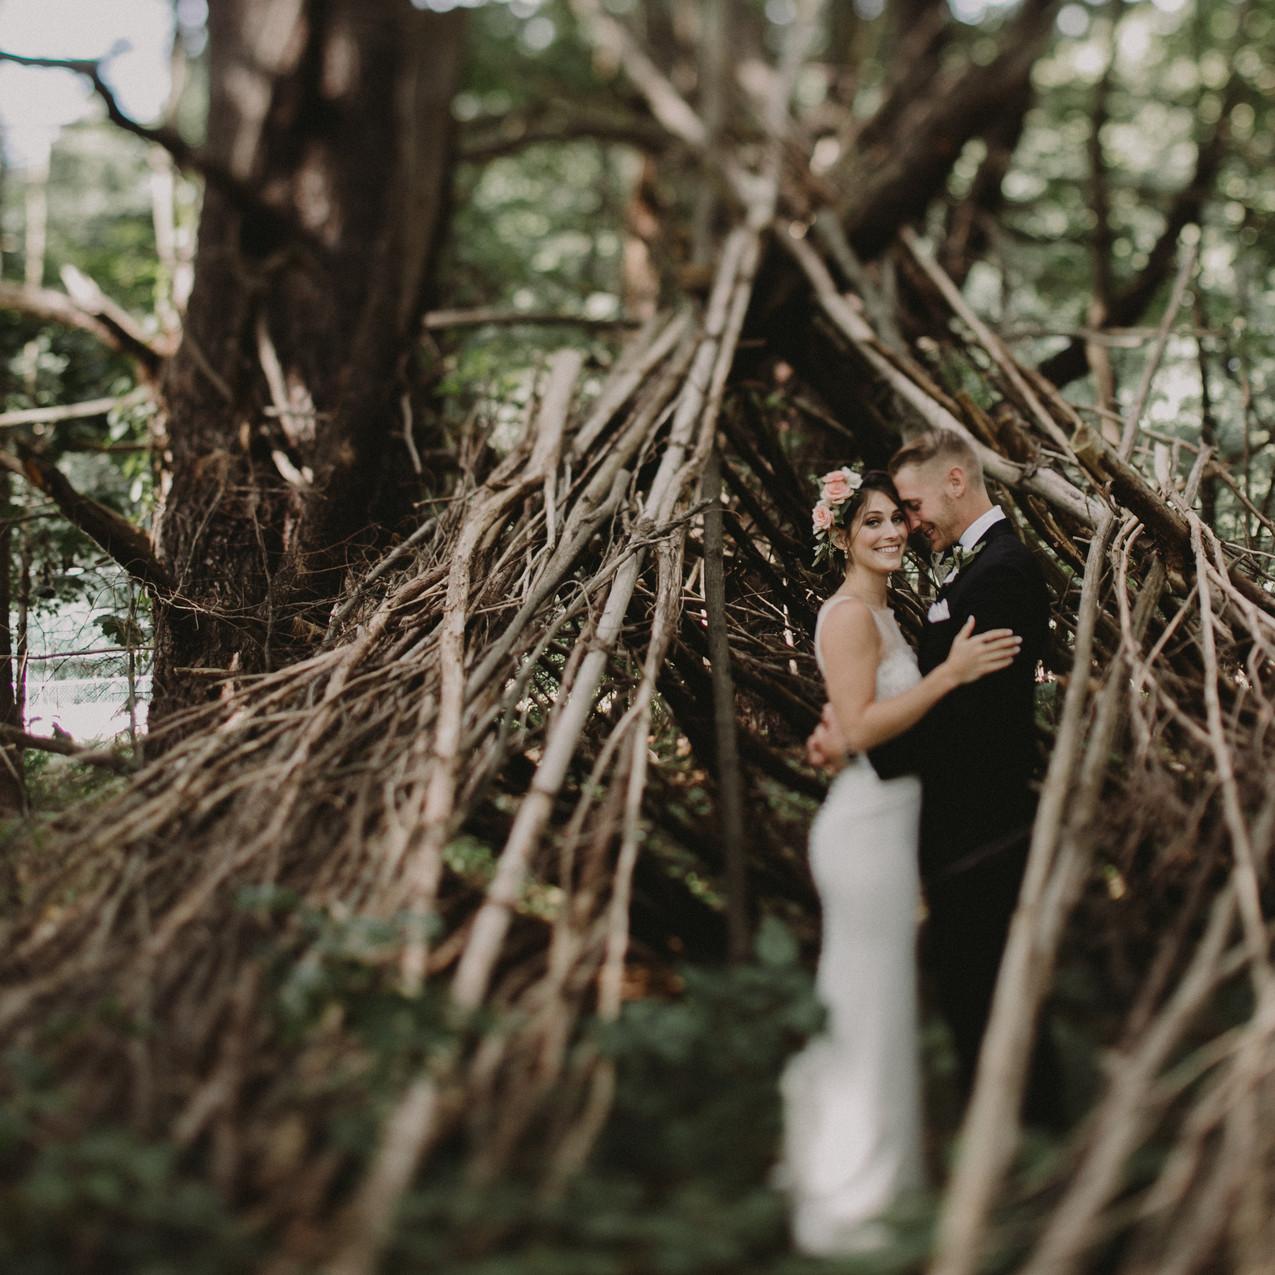 wedding careering in new england